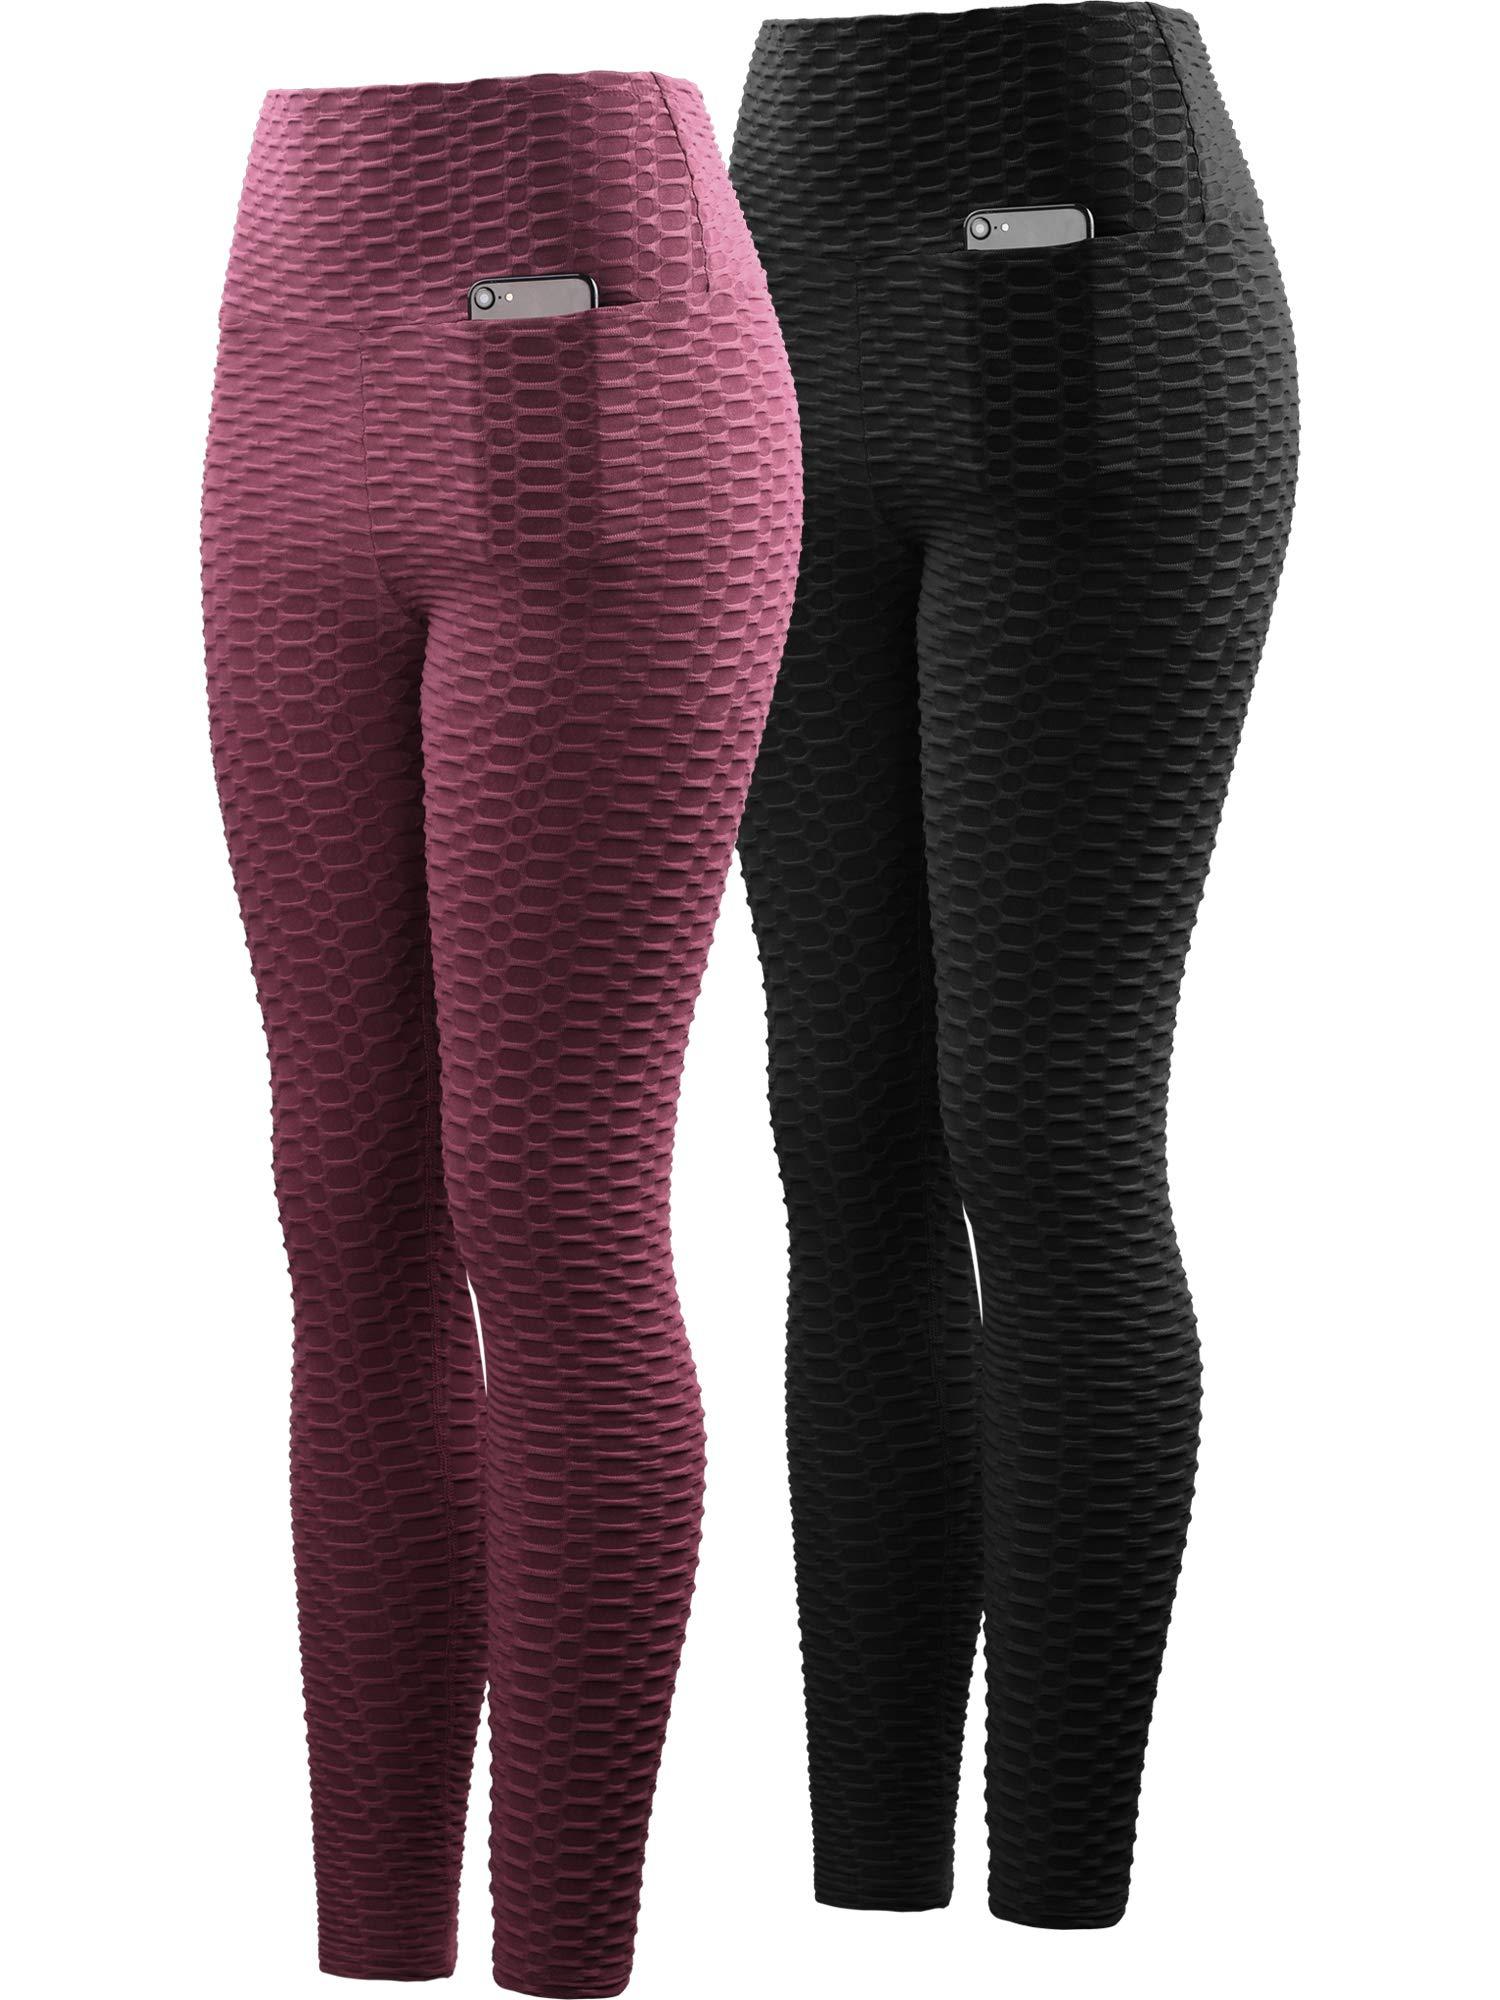 Neleus Women's 2 Pack Tummy Control High Waist Leggings Out Pocket,9036,Black/Maroon,S,EU M by Neleus (Image #1)